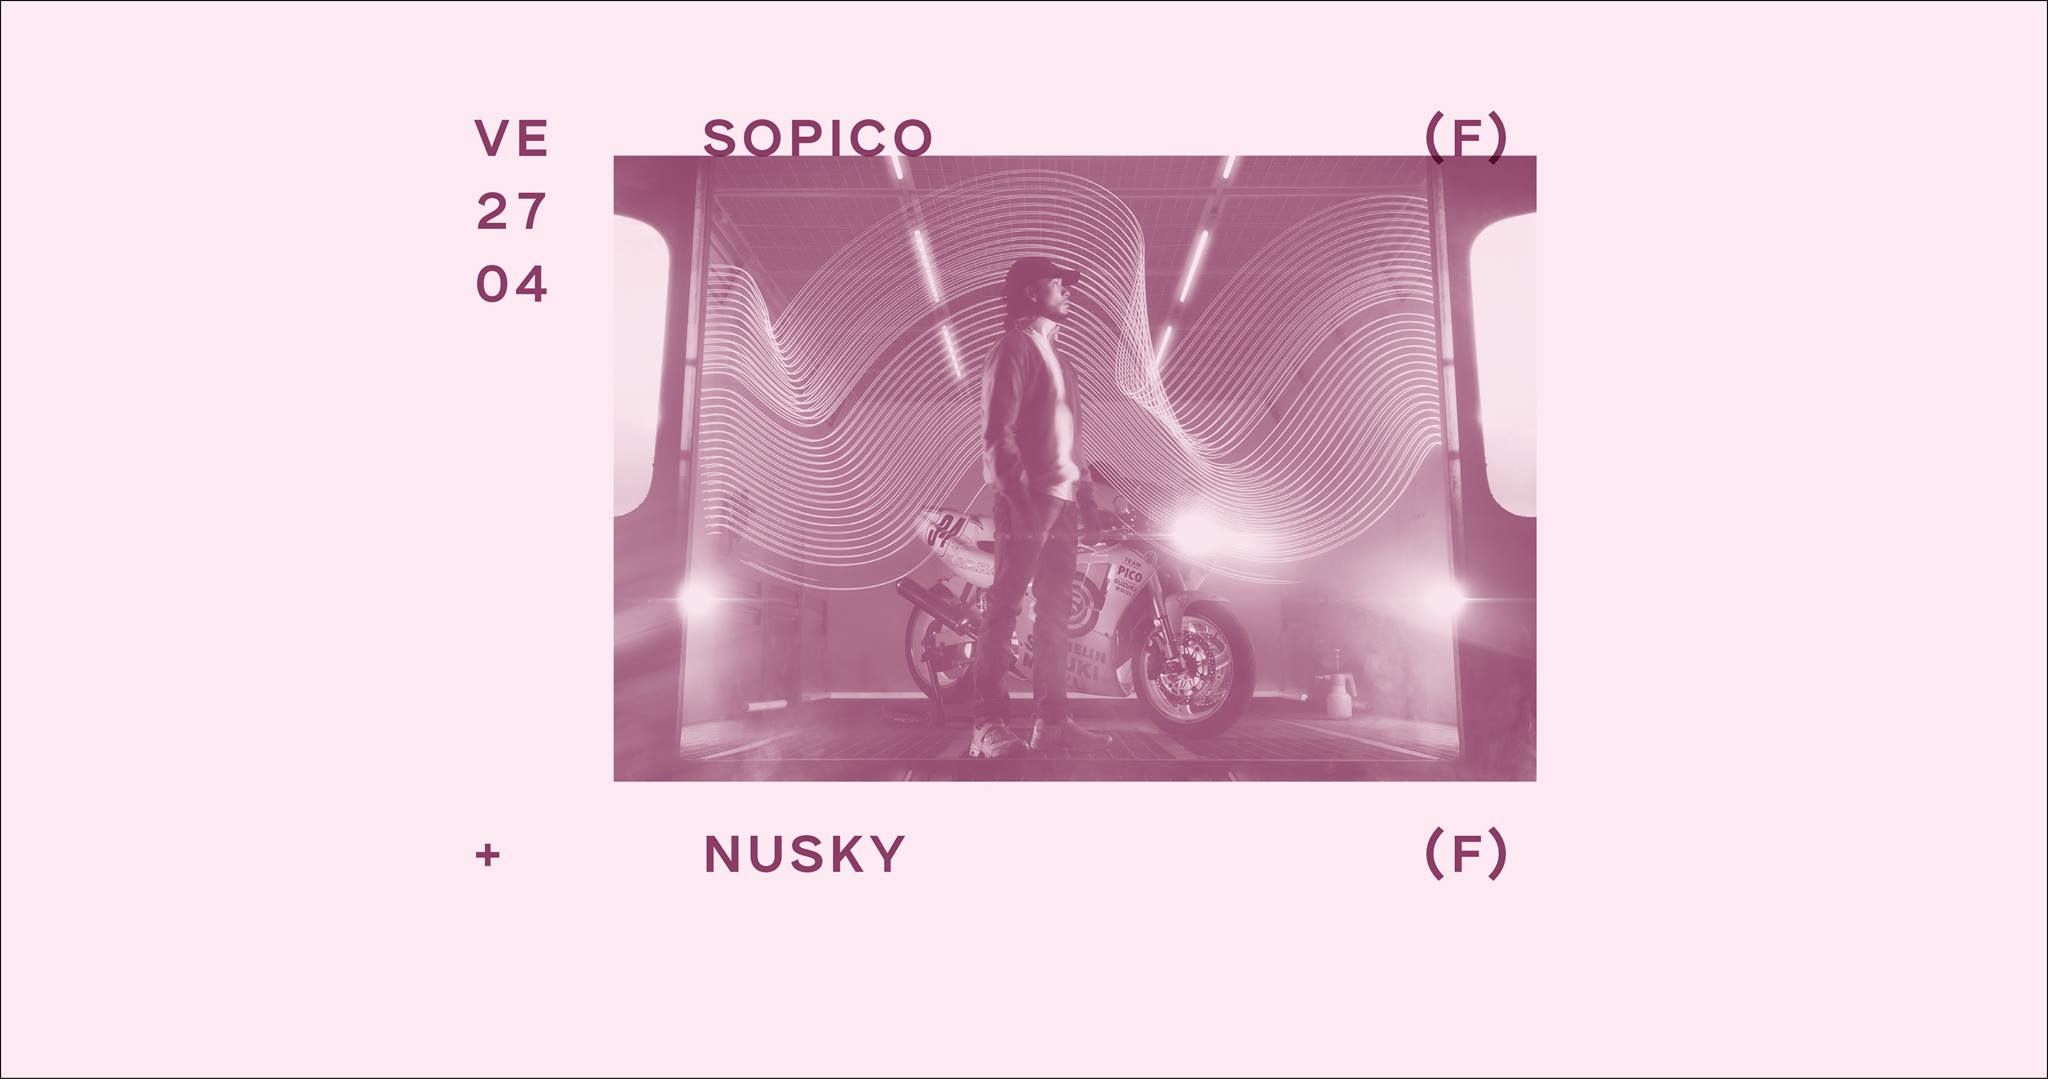 Sopico / Nusky @ Port Franc